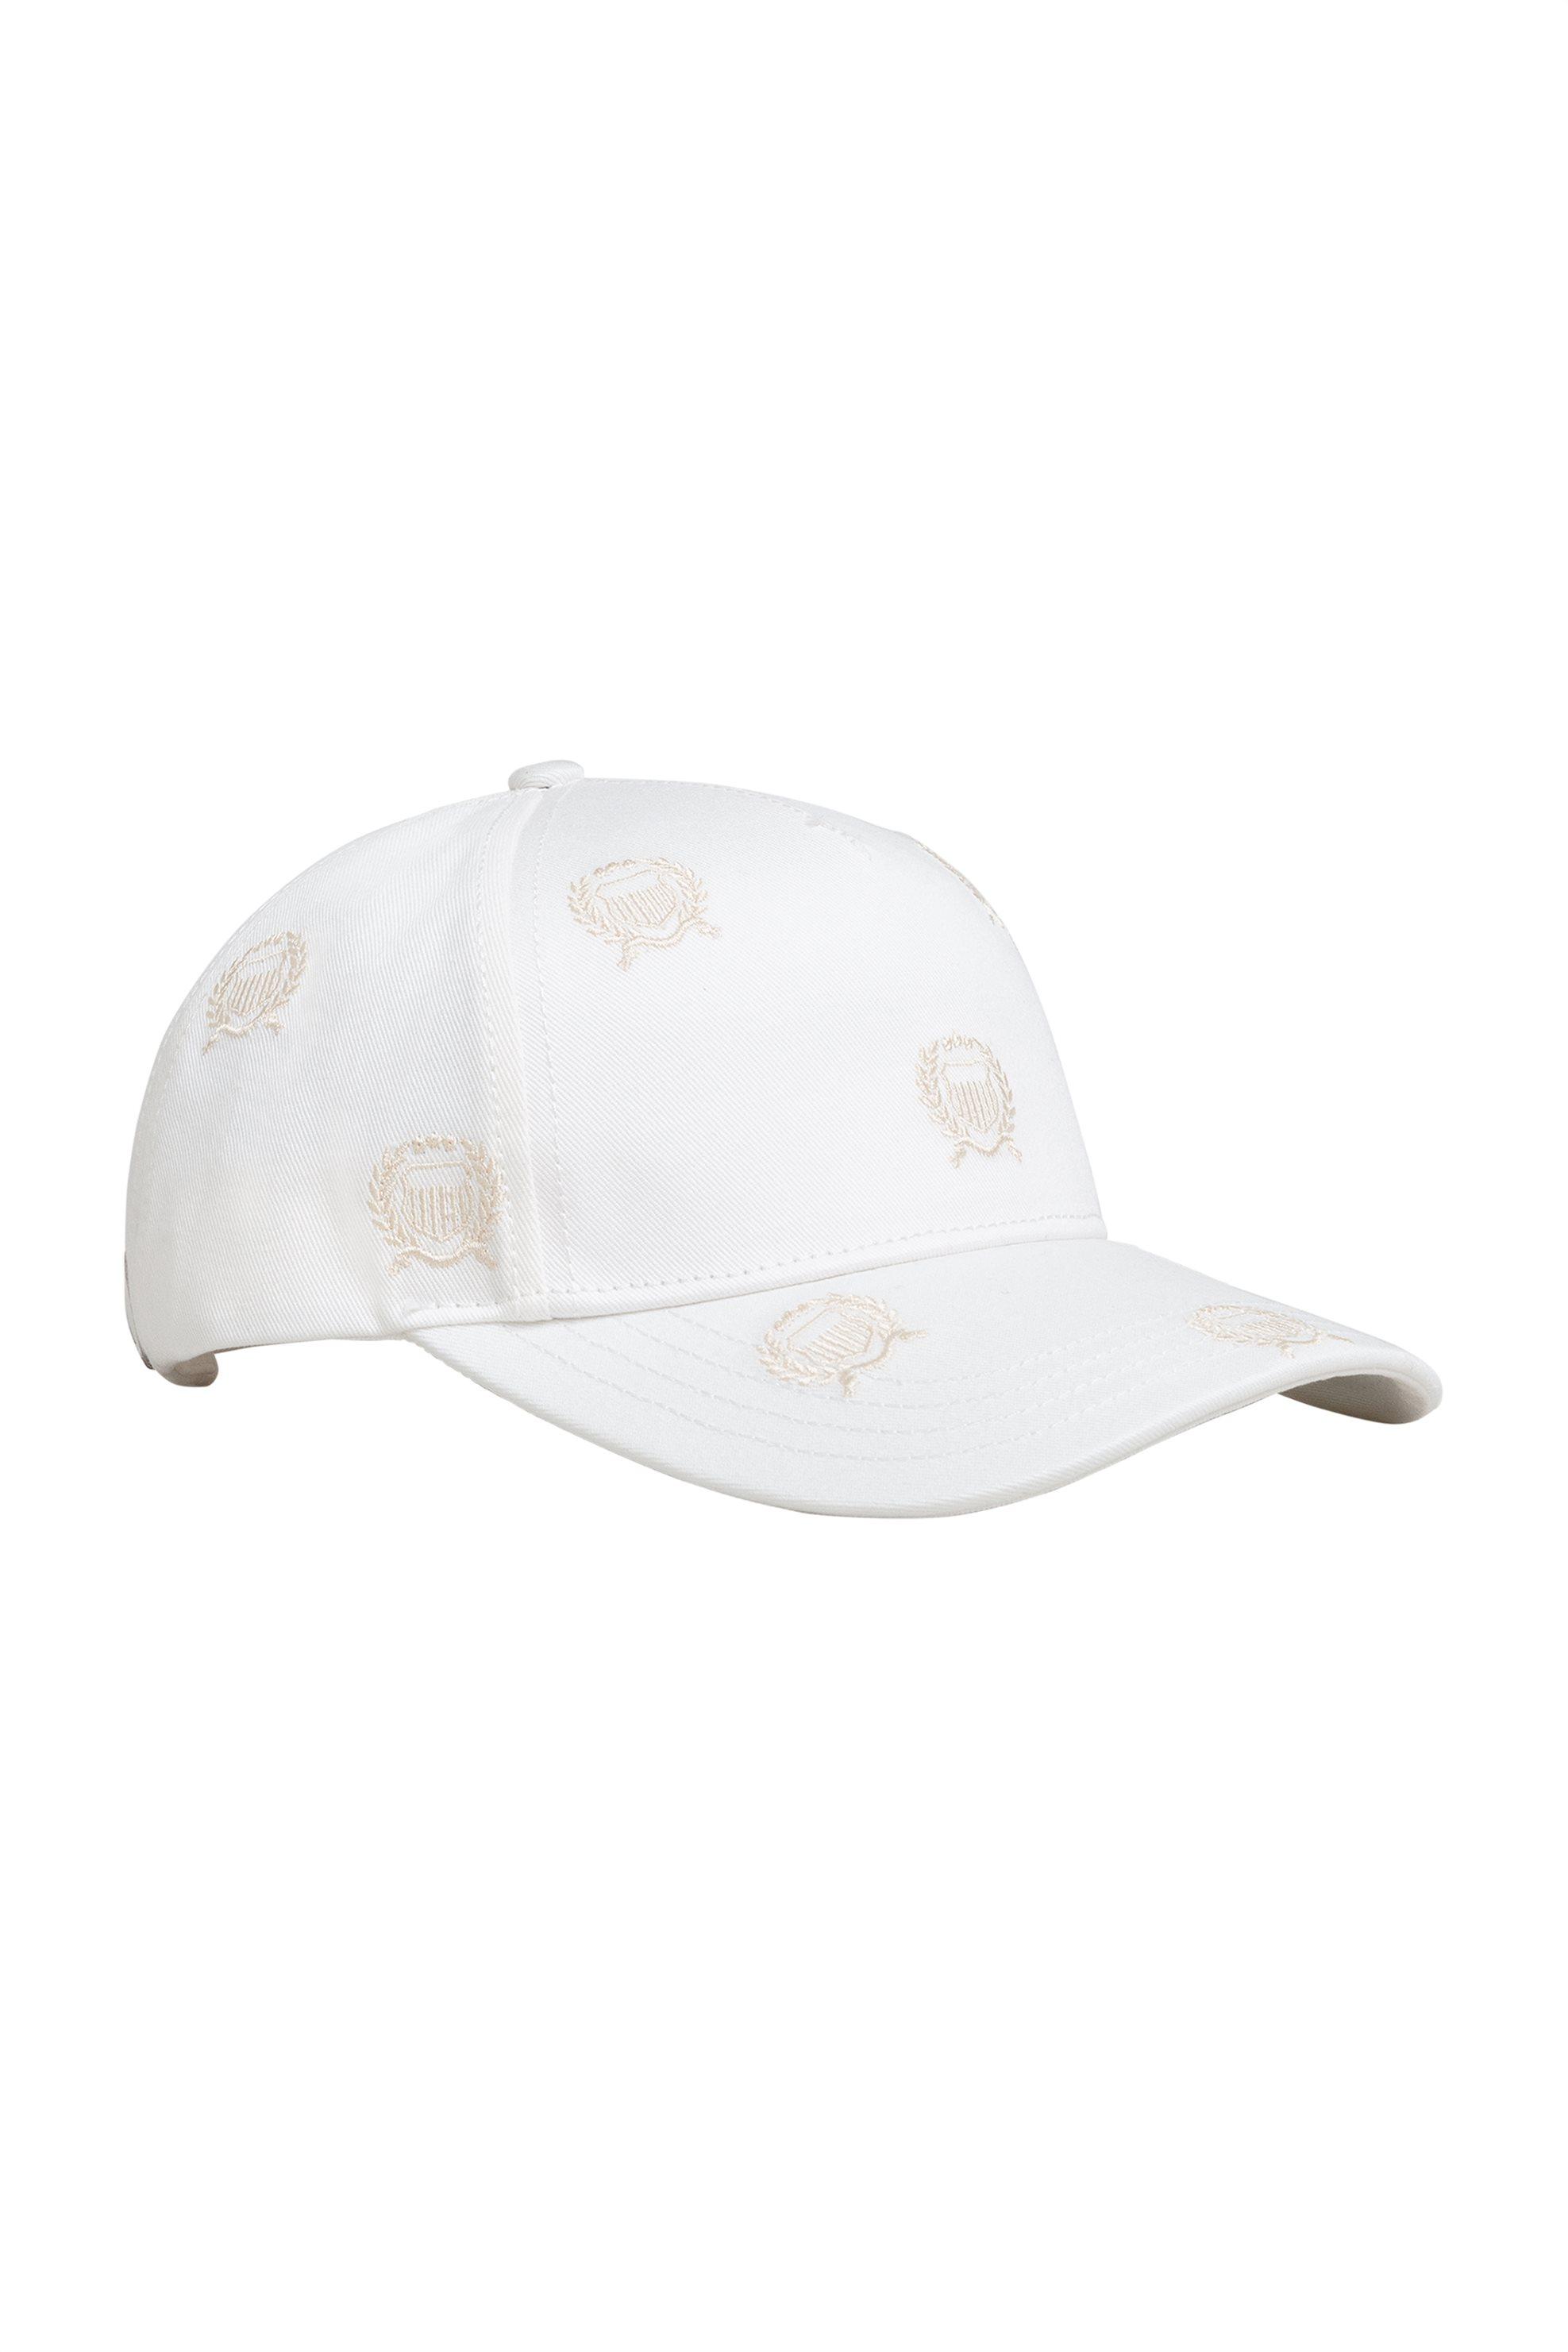 Gant γυναικείο καπελο jockey με logo κεντήματα ''Crest'' - 4900034 - Εκρού